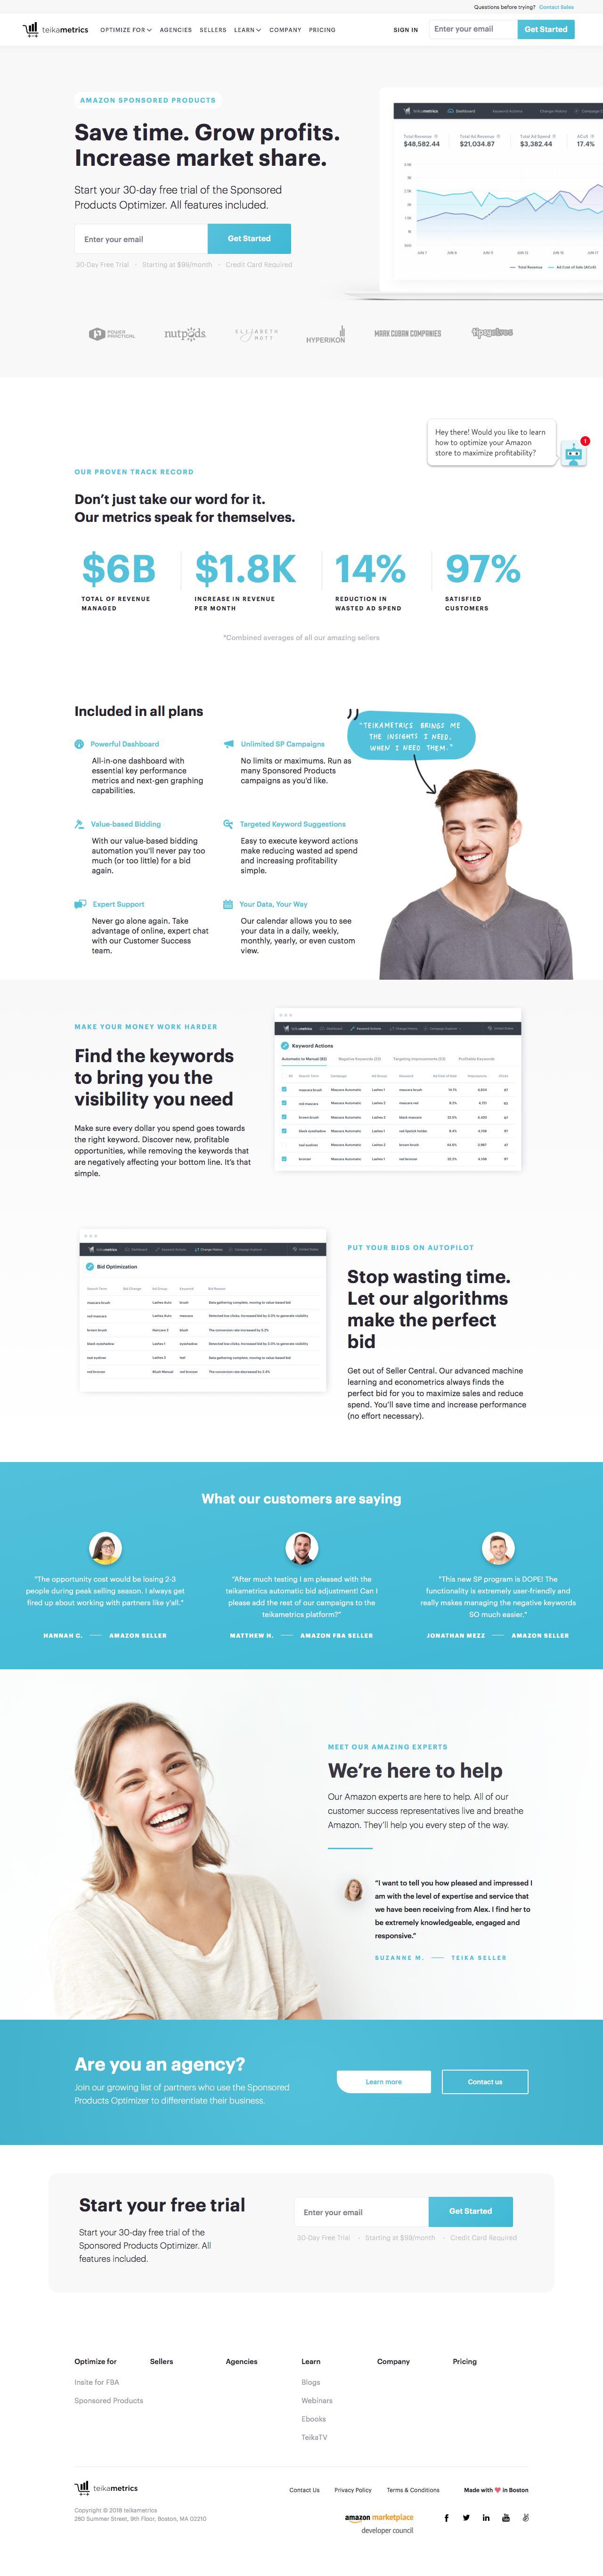 Screenshot of teikametrics.com - Start increasing your sales profitability | Teikametrics - captured June 18, 2018